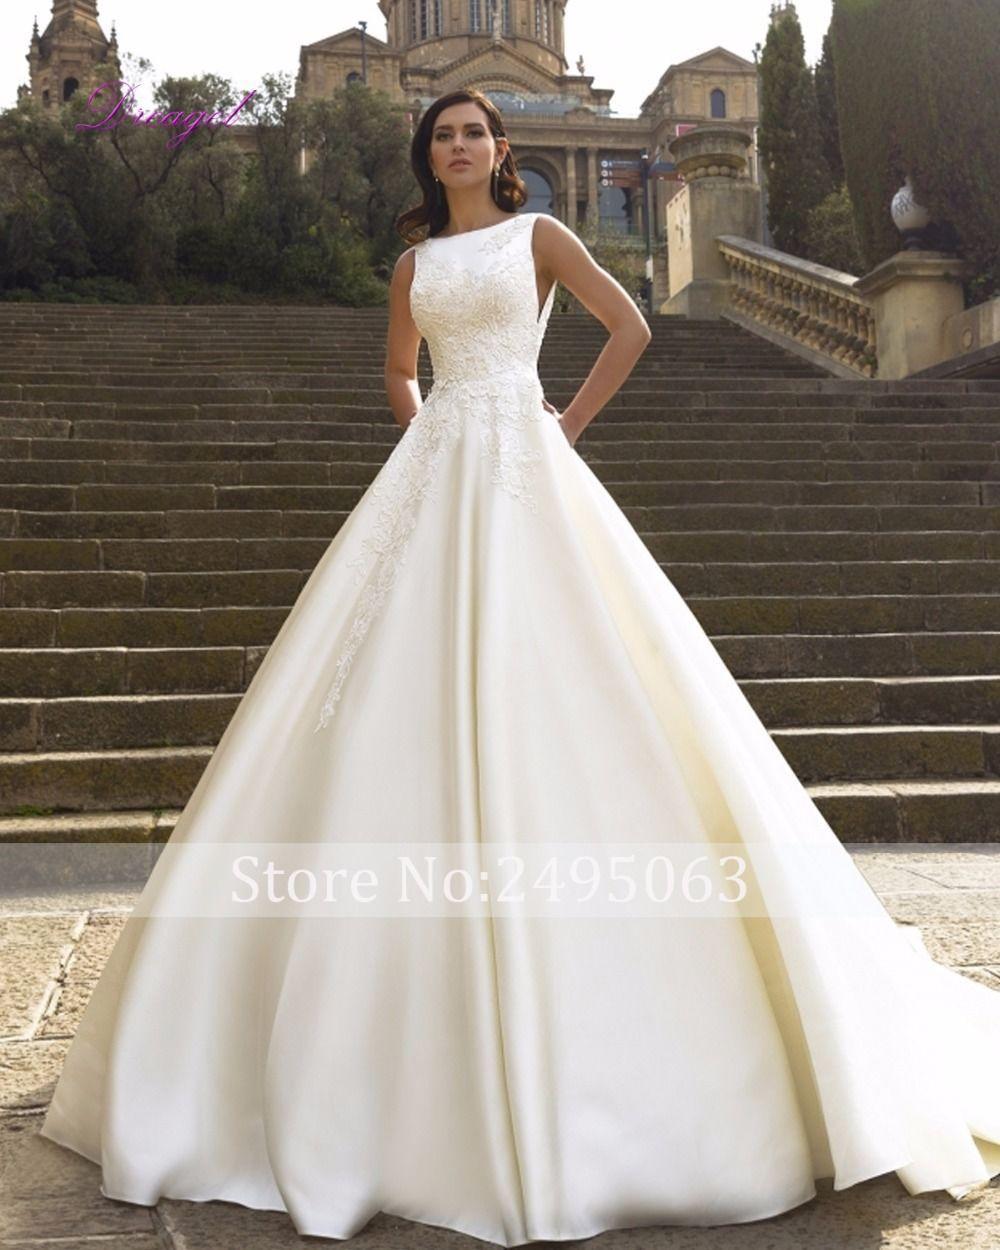 Custom Made White Ivory Satin Ball Gown Wedding Dress Bridal Dress Gown V Neck 931699420490 Eb Aline Wedding Dress Ball Gown Wedding Dress Ball Gowns Wedding